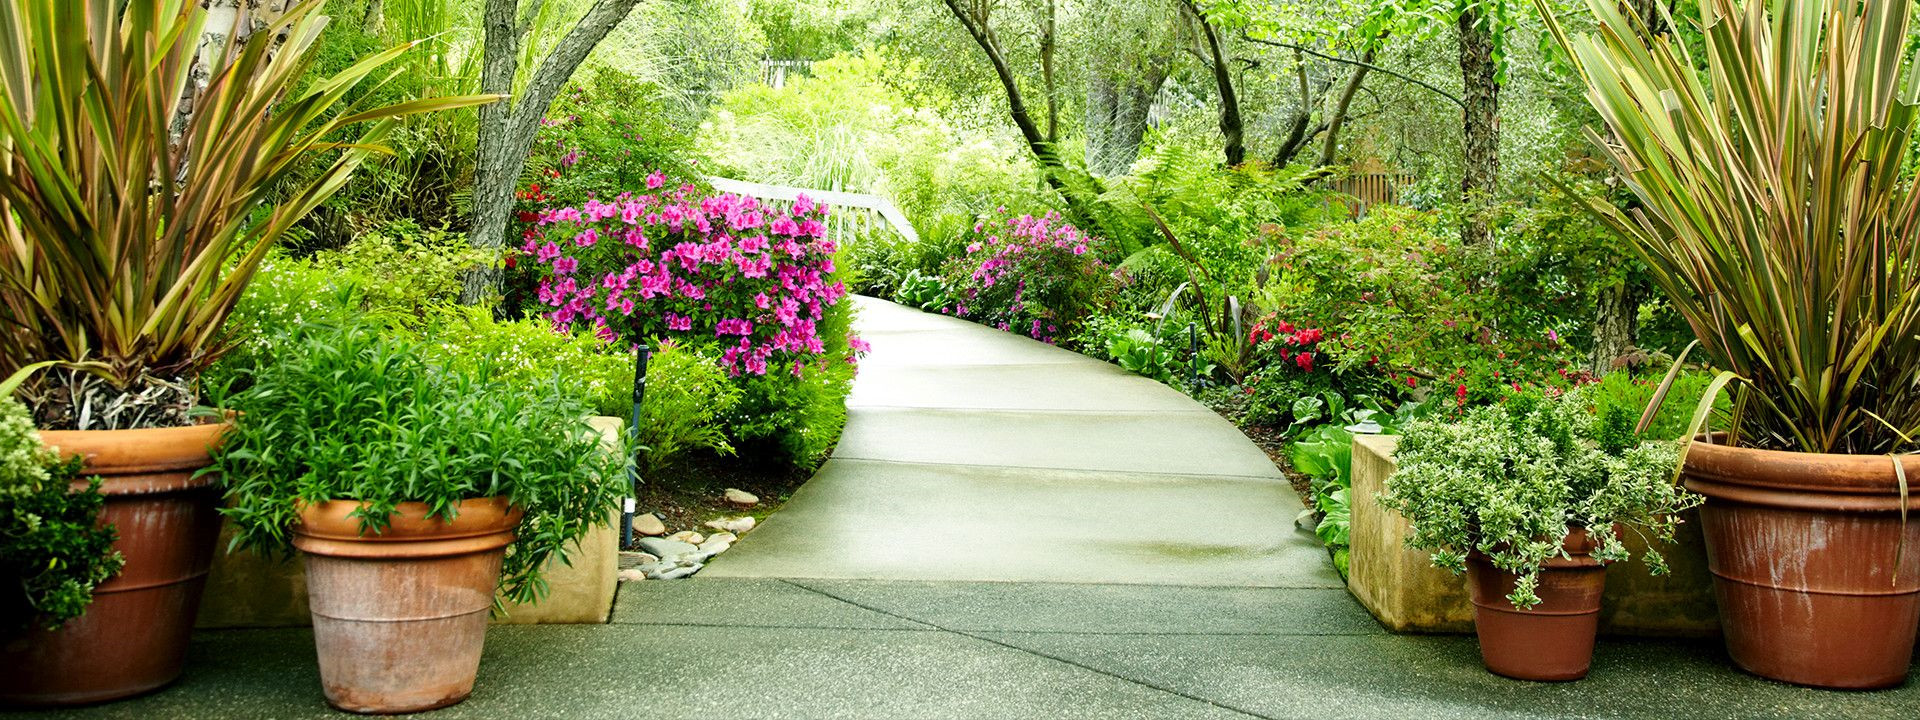 Resources | Serenity Funerals & Crematory